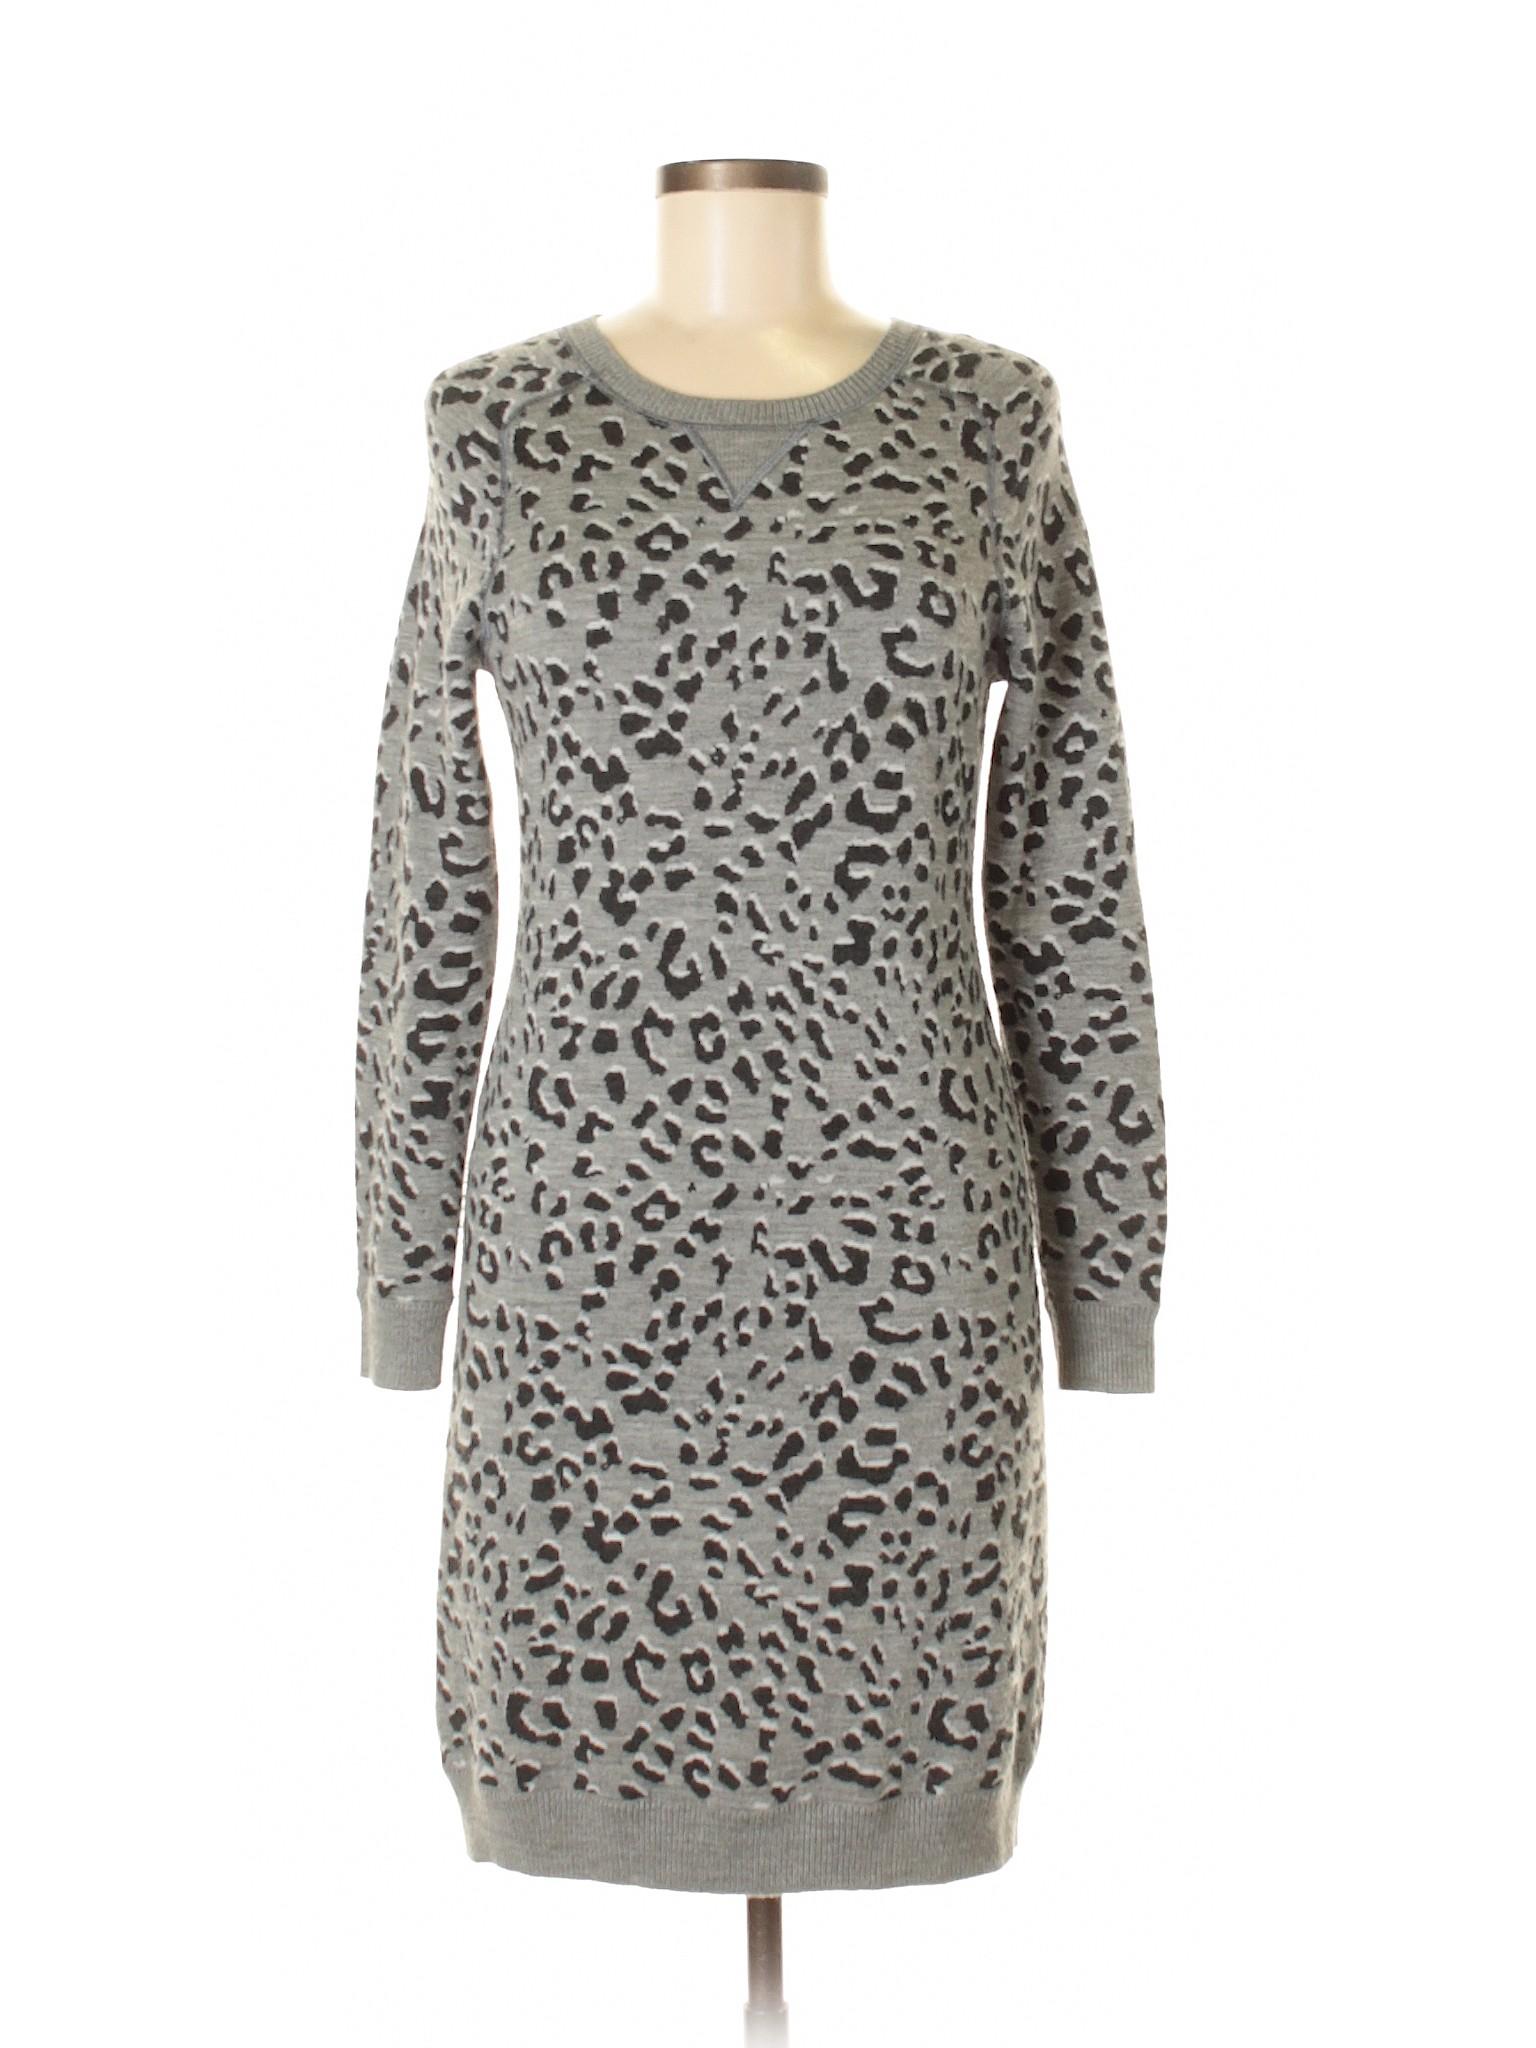 Ann Casual Taylor Dress Boutique LOFT winter xA5wPqWnF0